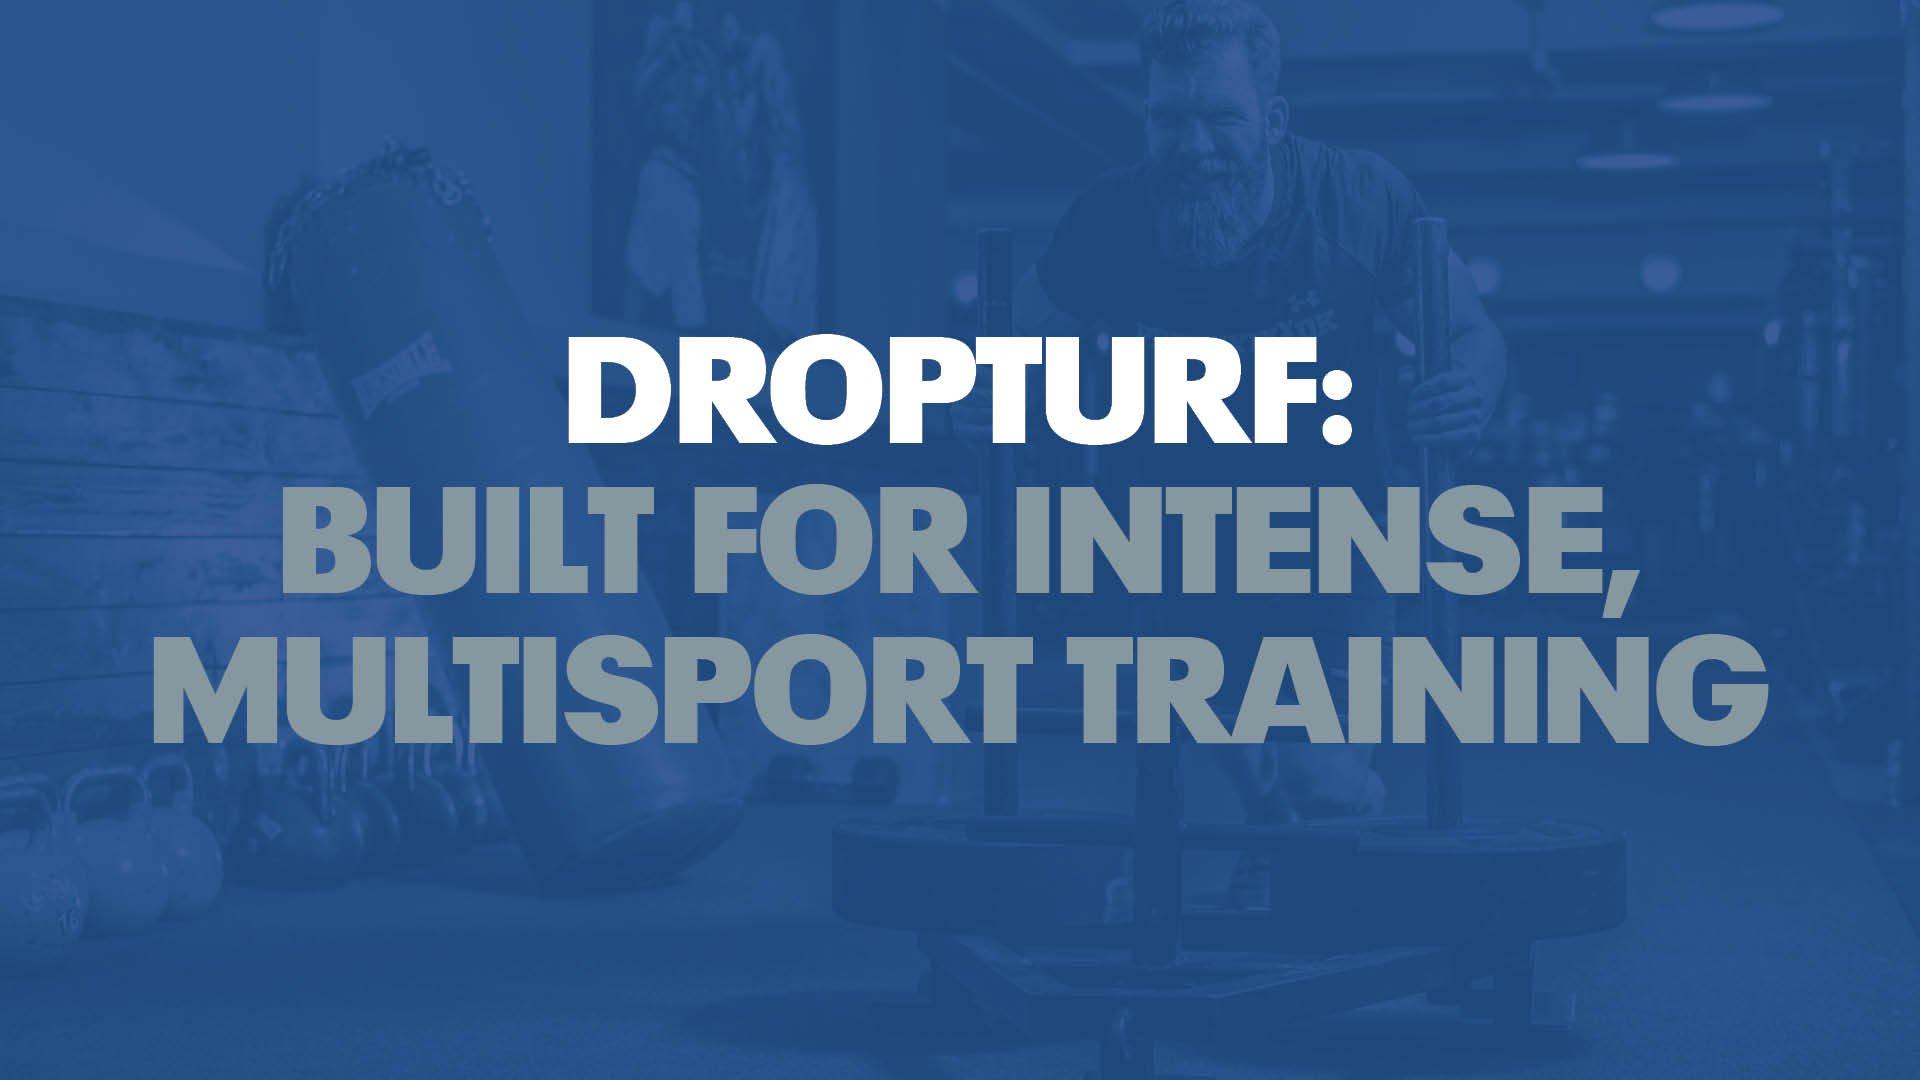 DROPTURF: BUILT FOR INTENSE, MULTISPORT TRAINING